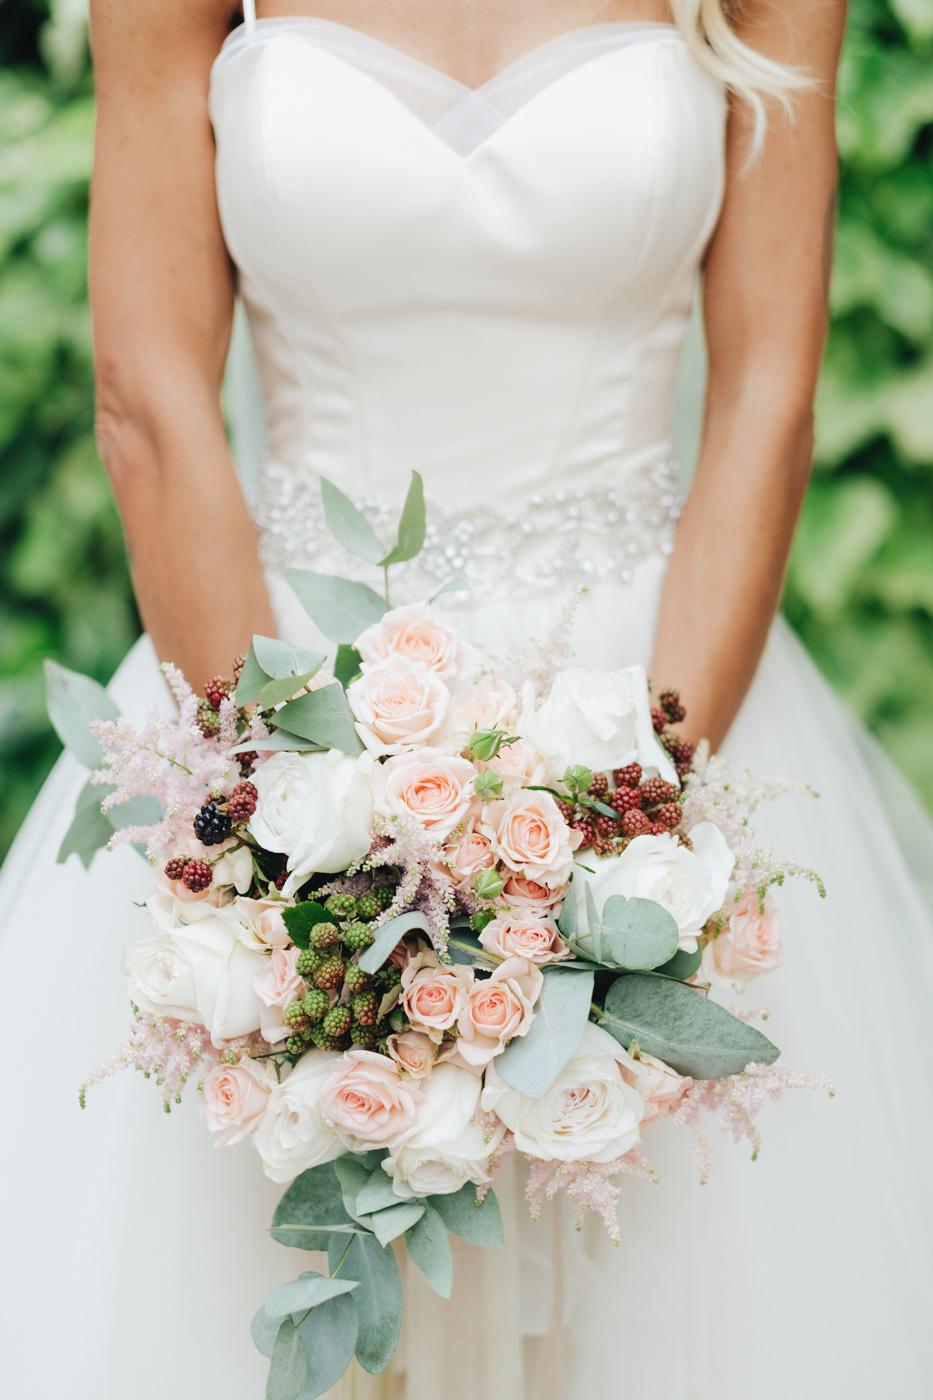 Matrimoni all'italiana wedding photographer italy-103.jpg